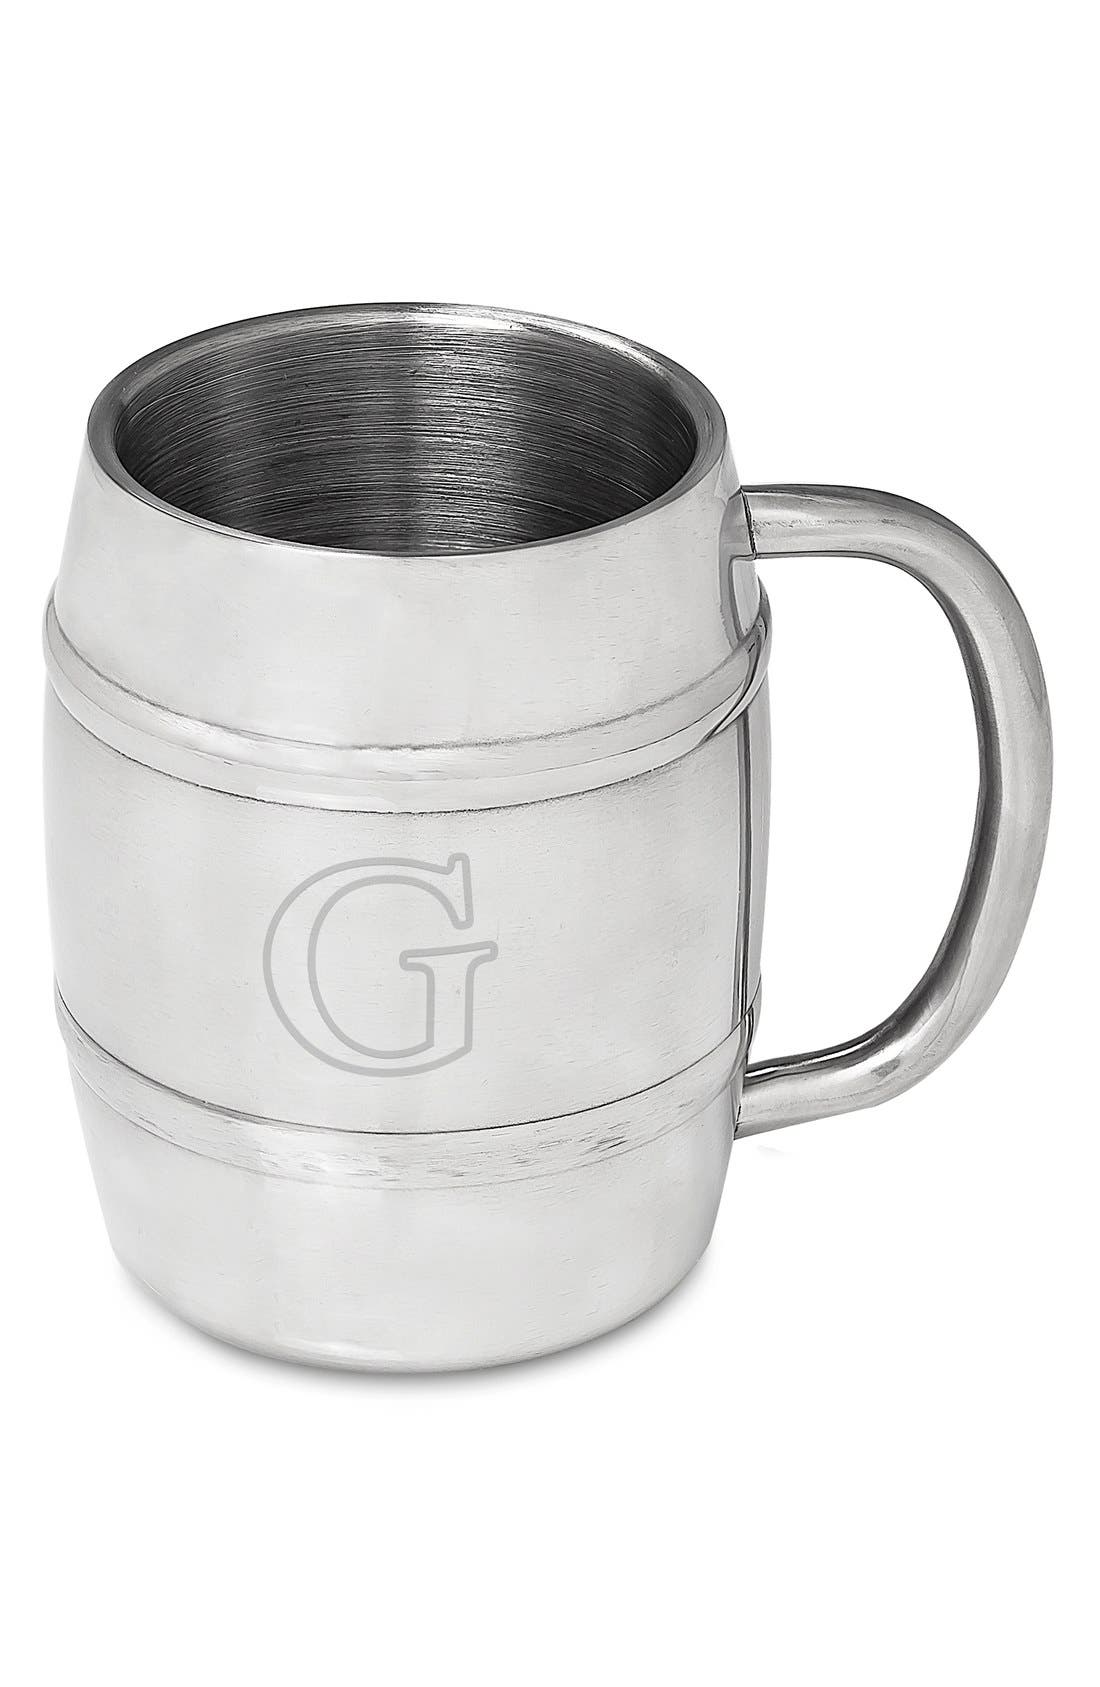 Monogram Stainless Steel Keg Mug,                             Main thumbnail 9, color,